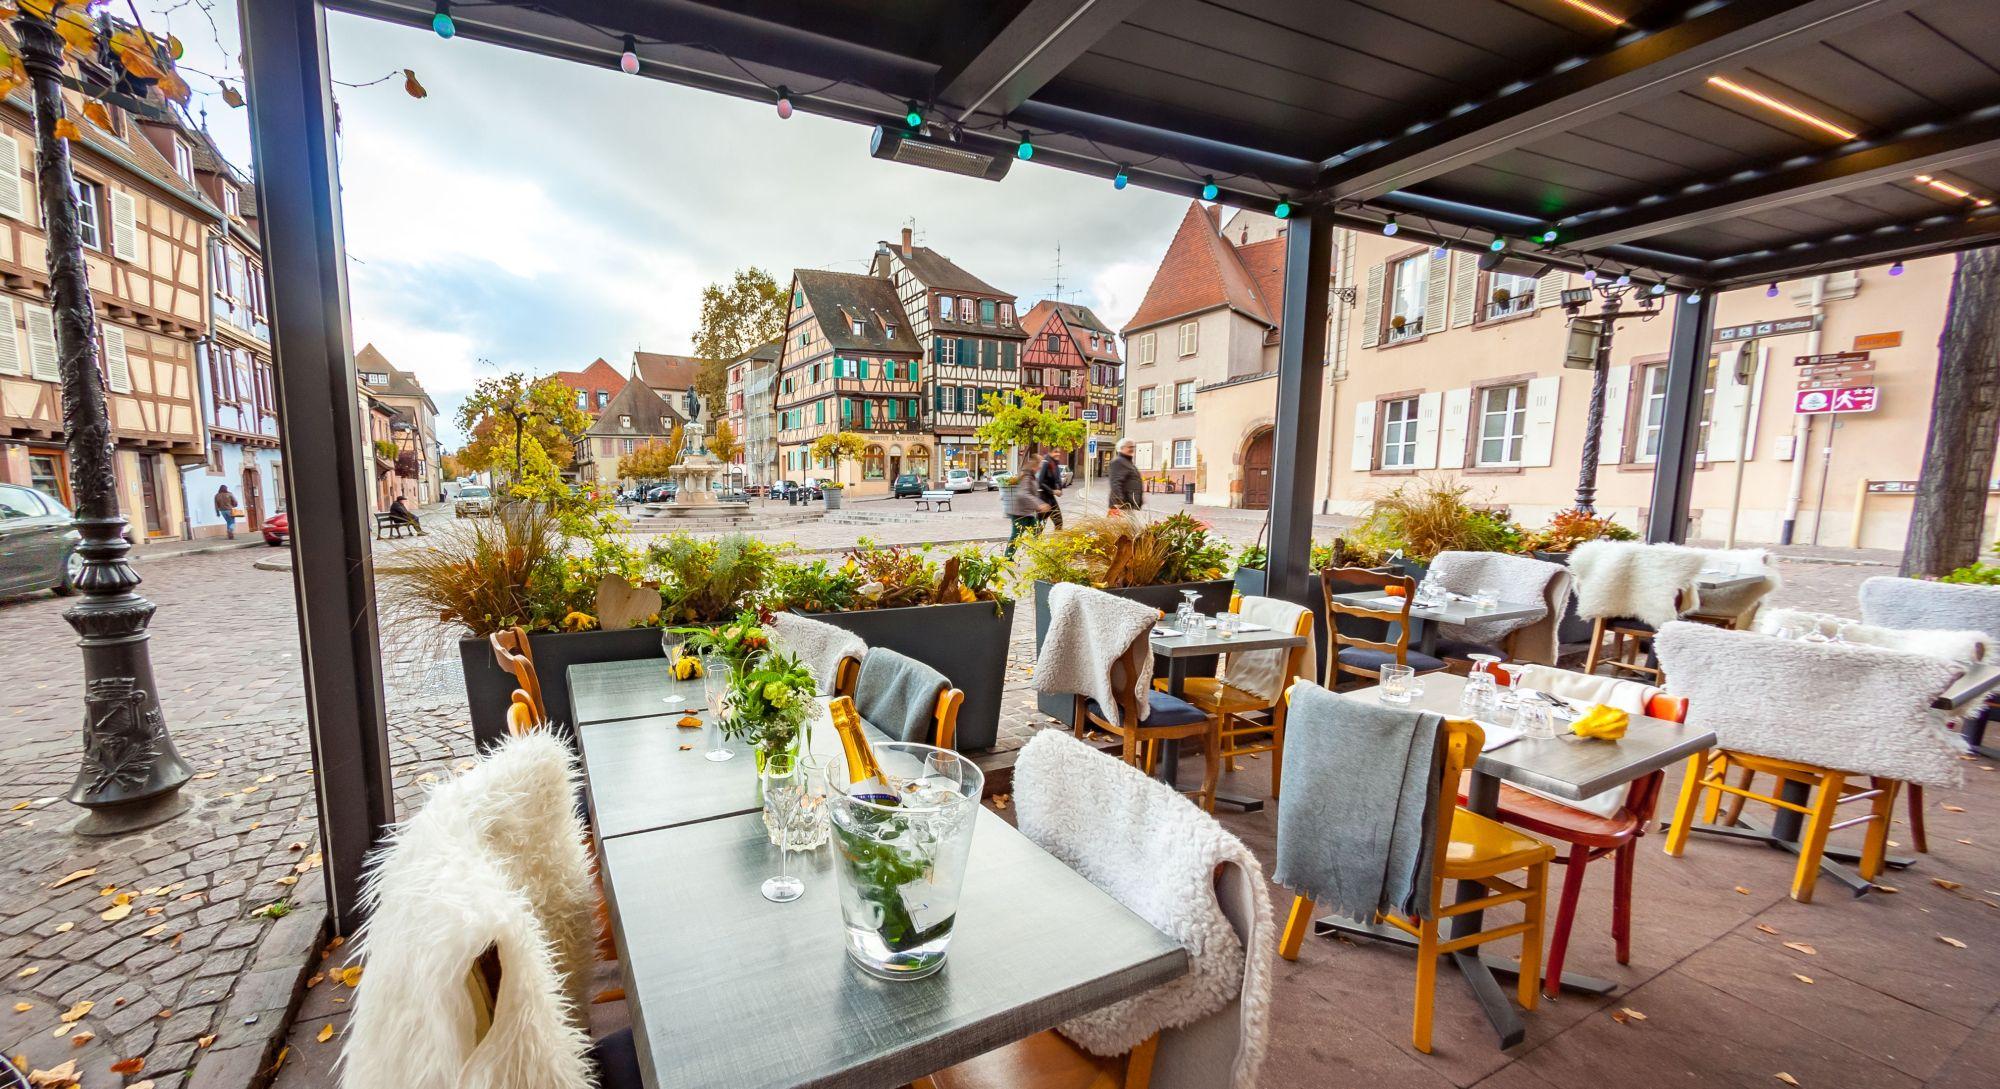 Bistrot des Lavandières Colmar, Alsace http://www.bistrotdeslavandieres.com/